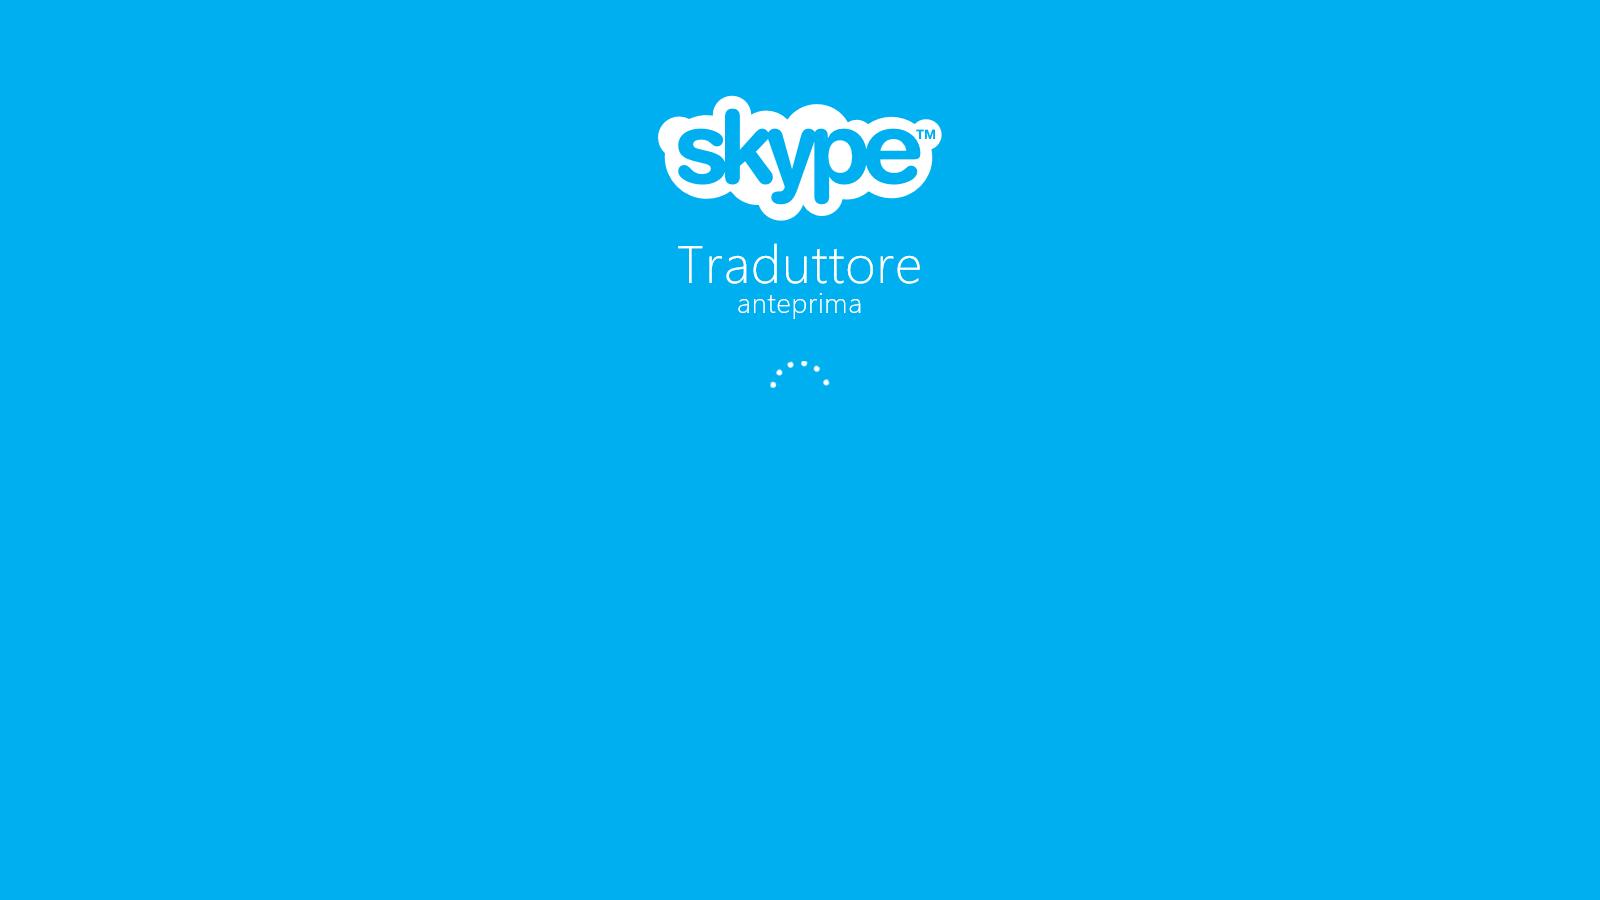 SkypeTranslatorPreview1